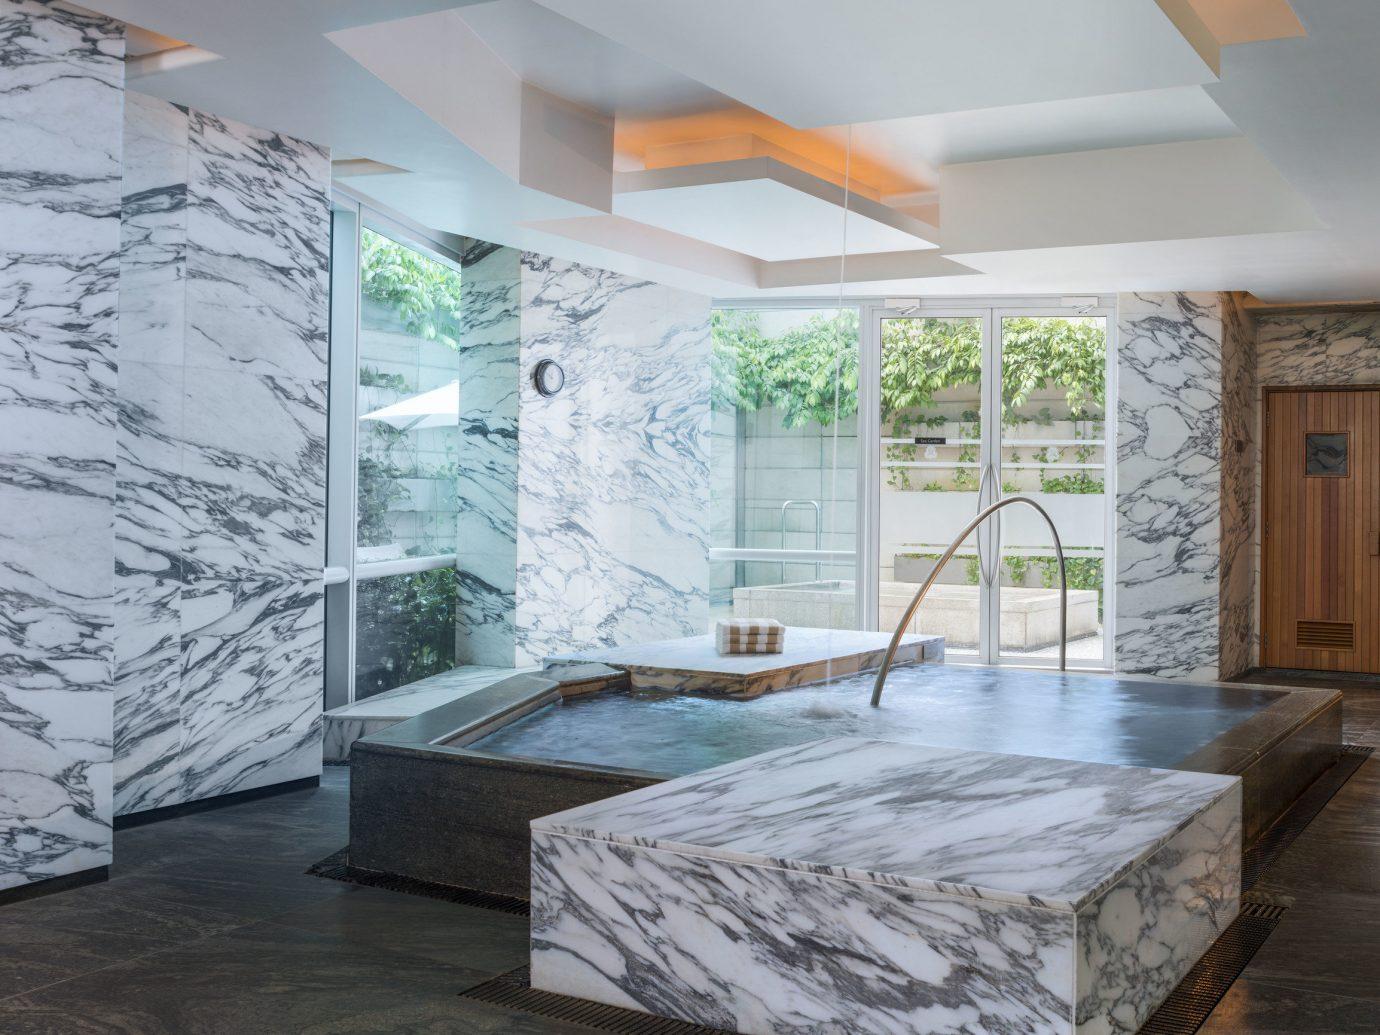 Health + Wellness Hotels Spa Retreats indoor floor ceiling room property house building estate home interior design real estate living room mansion furniture